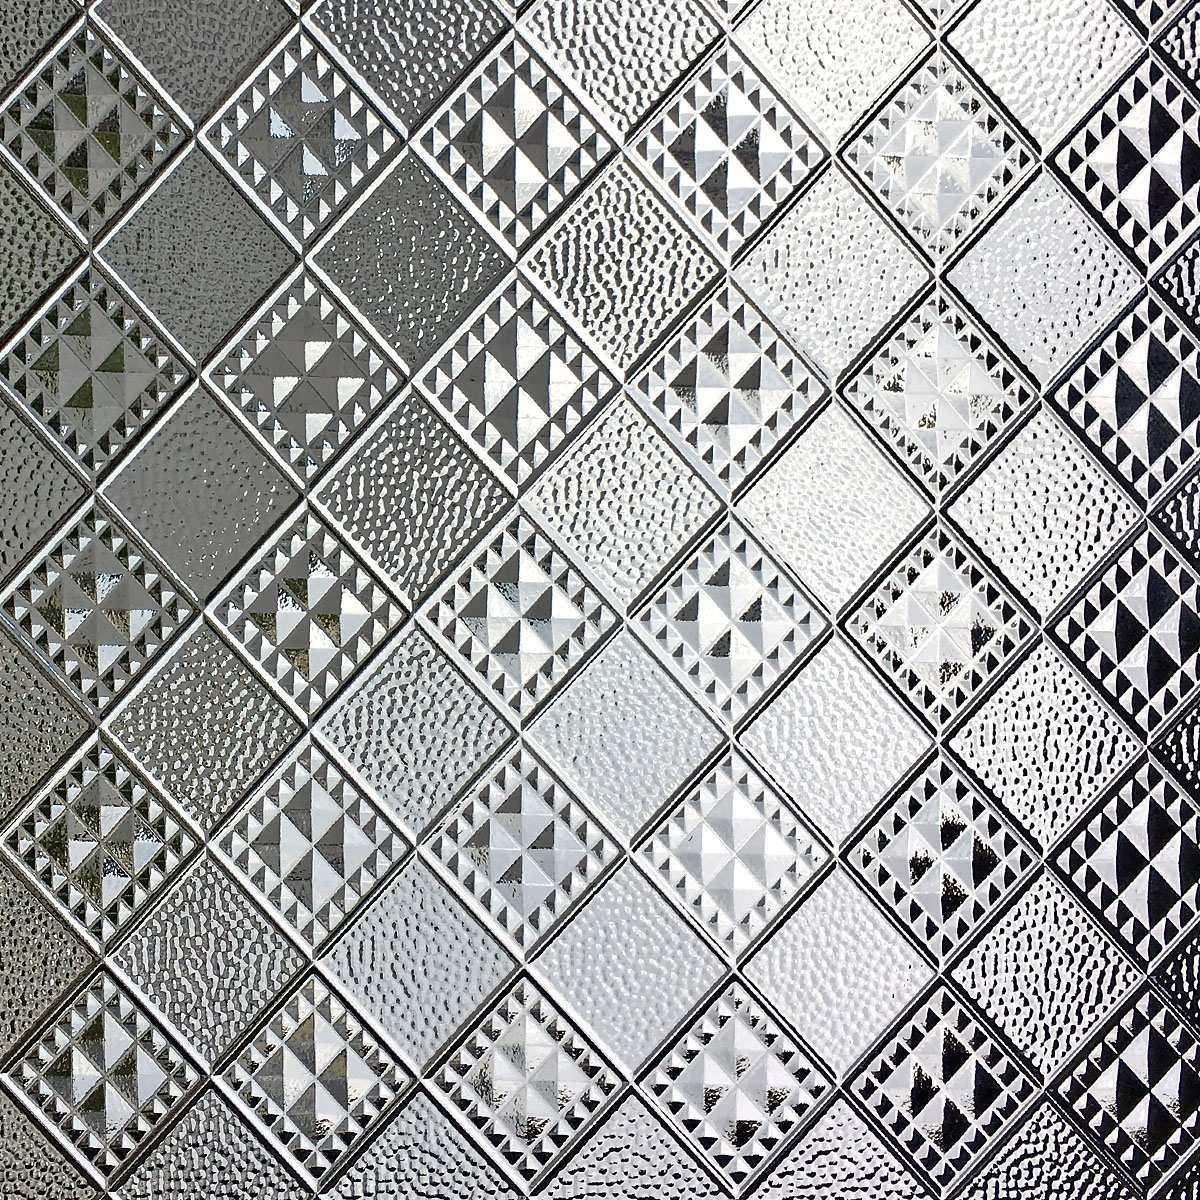 Ornamentglas Prisma 81 X 110 Weiss Von Replicata Replikate